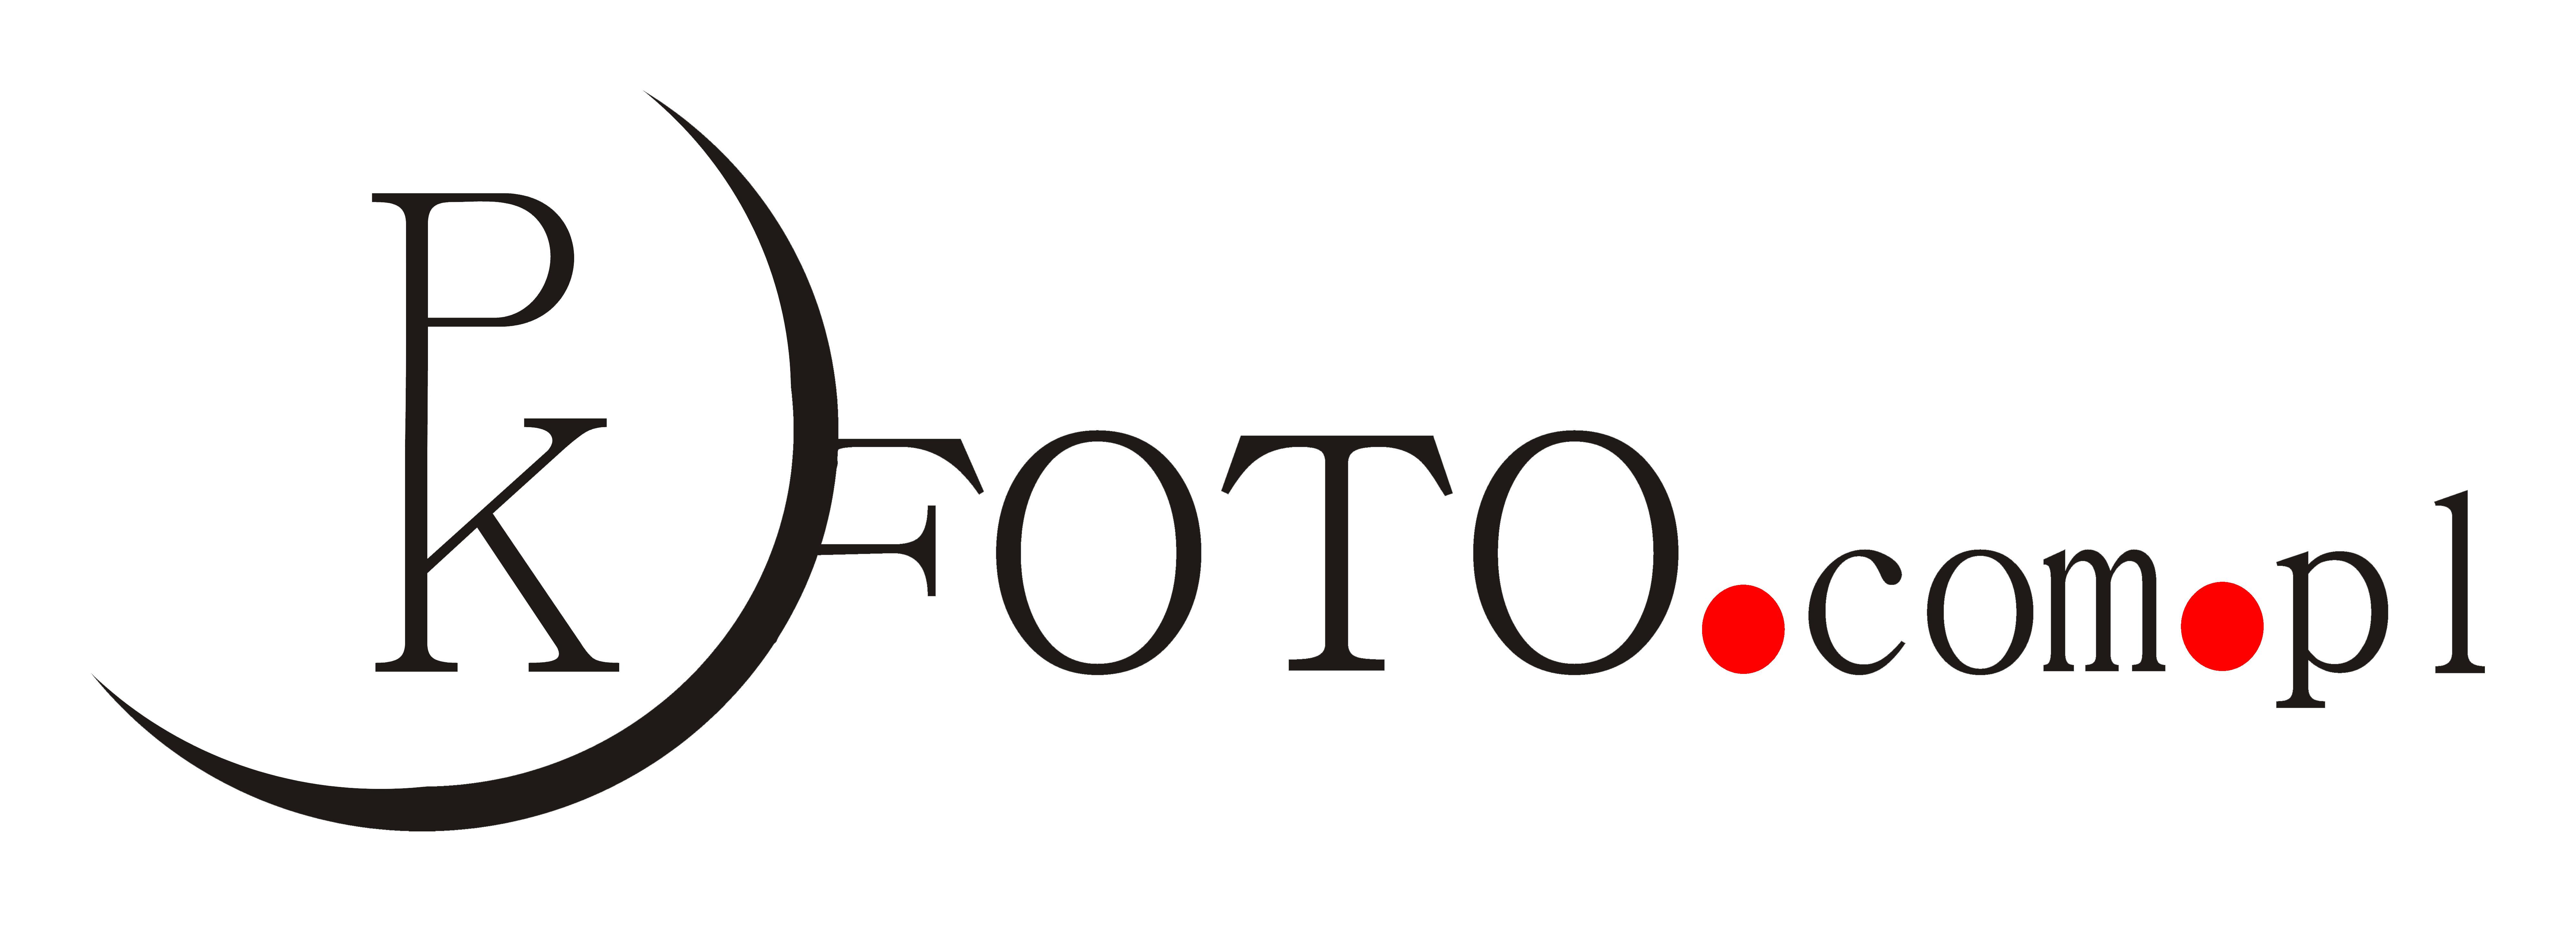 PKFoto.com.pl